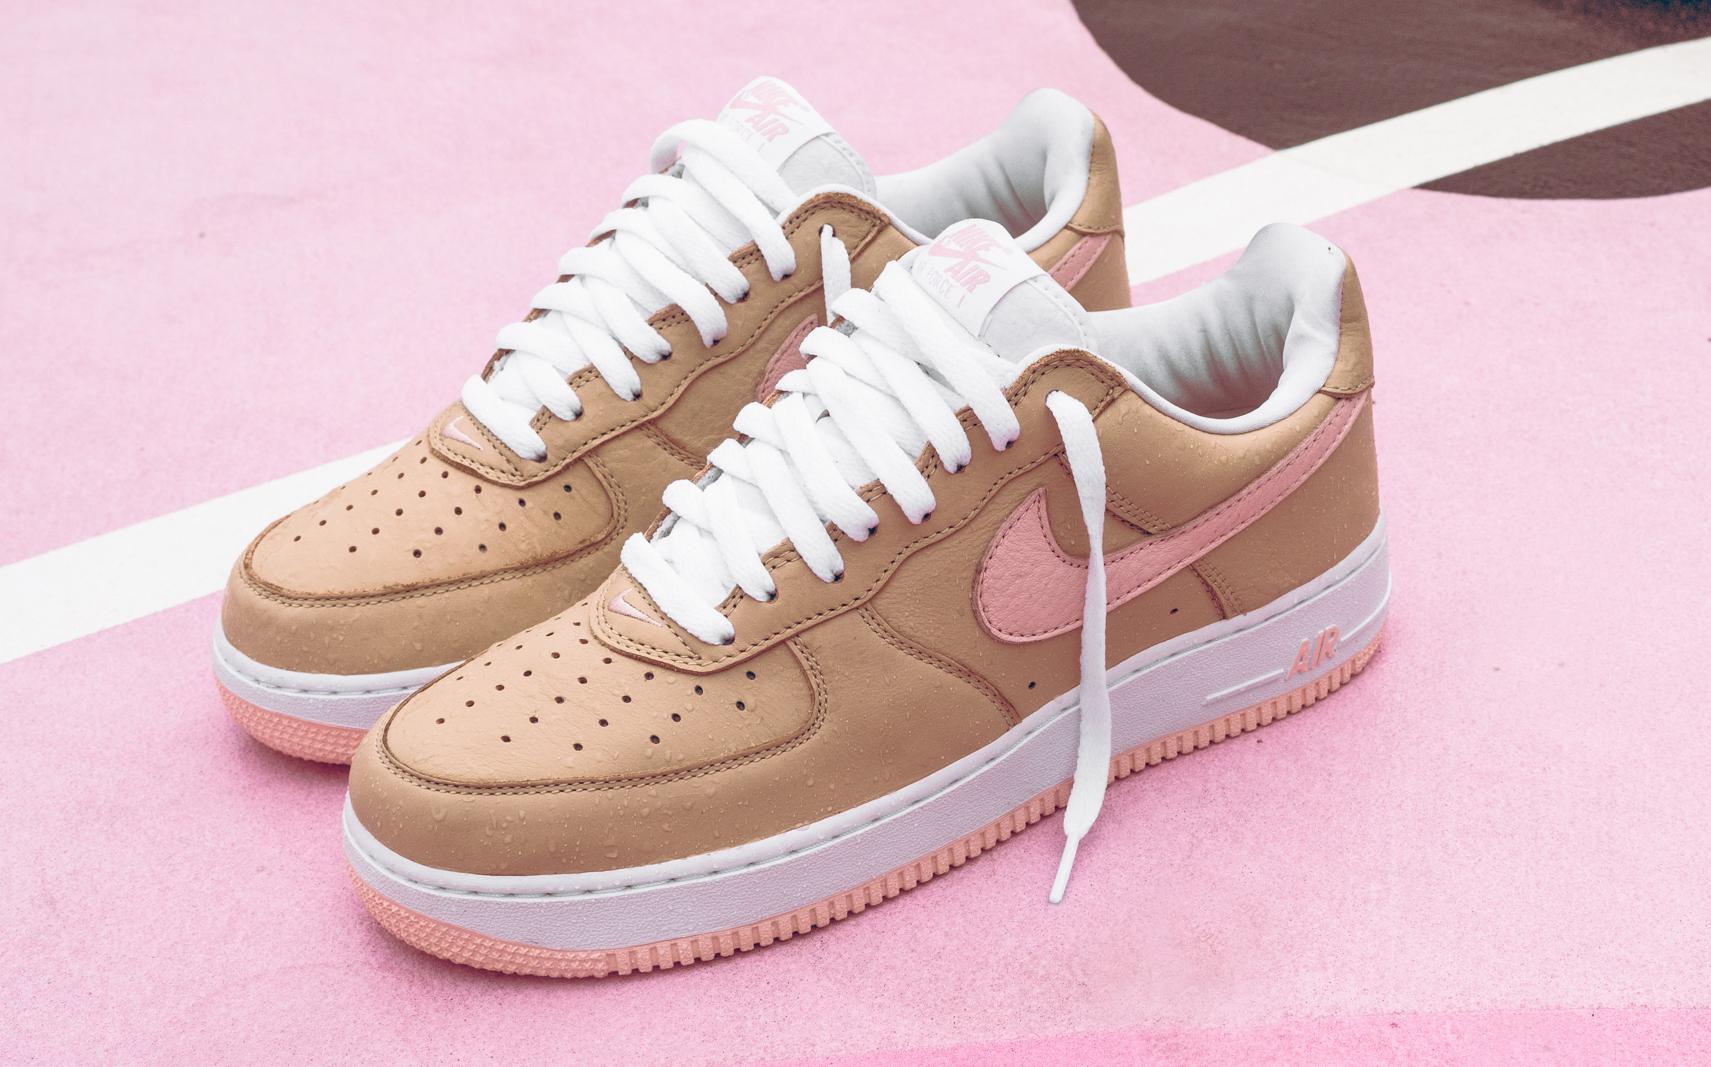 Nike Air Force 1 Linen 2016